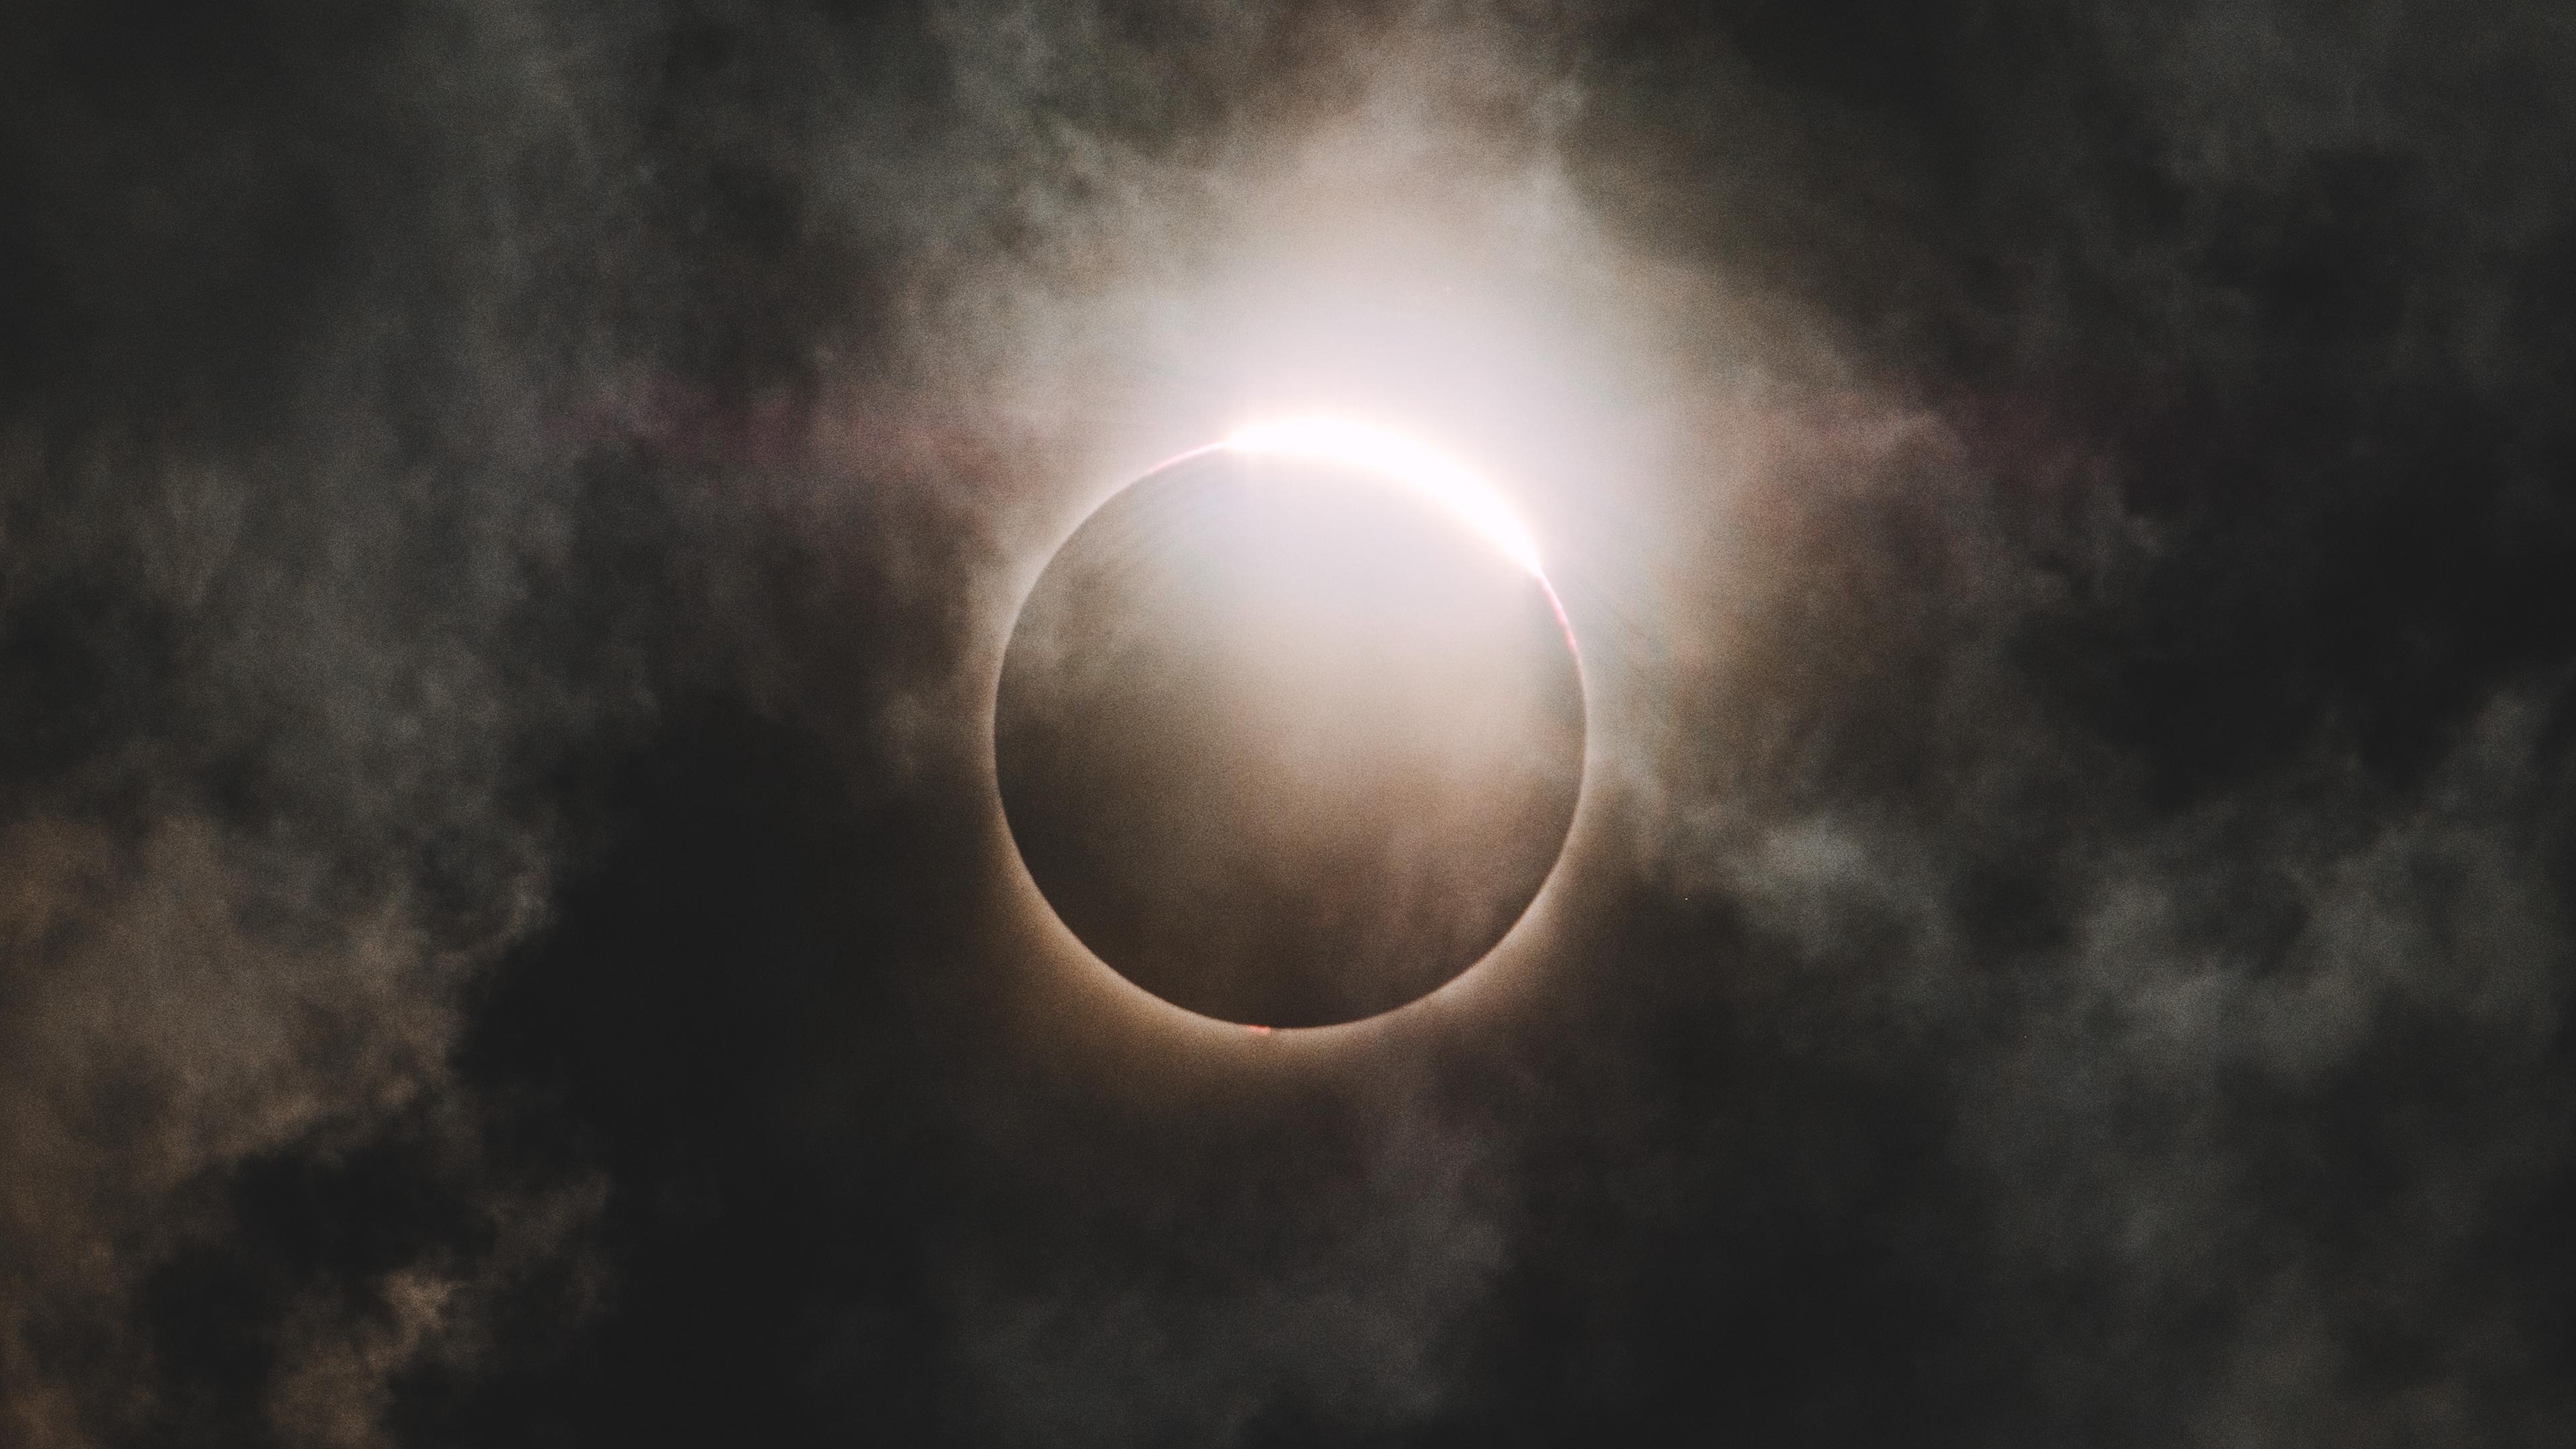 eclipse moon sun sky 4k 1541114109 - eclipse, moon, sun, sky 4k - Sun, Moon, Eclipse